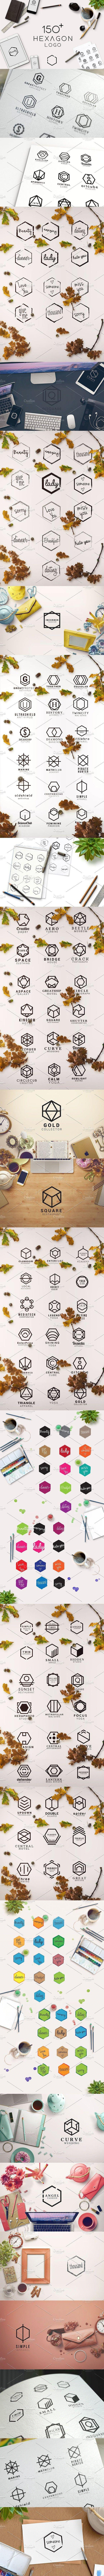 150+ Minimal Hexagon Logo Templates. Best Wedding Template. $25.00